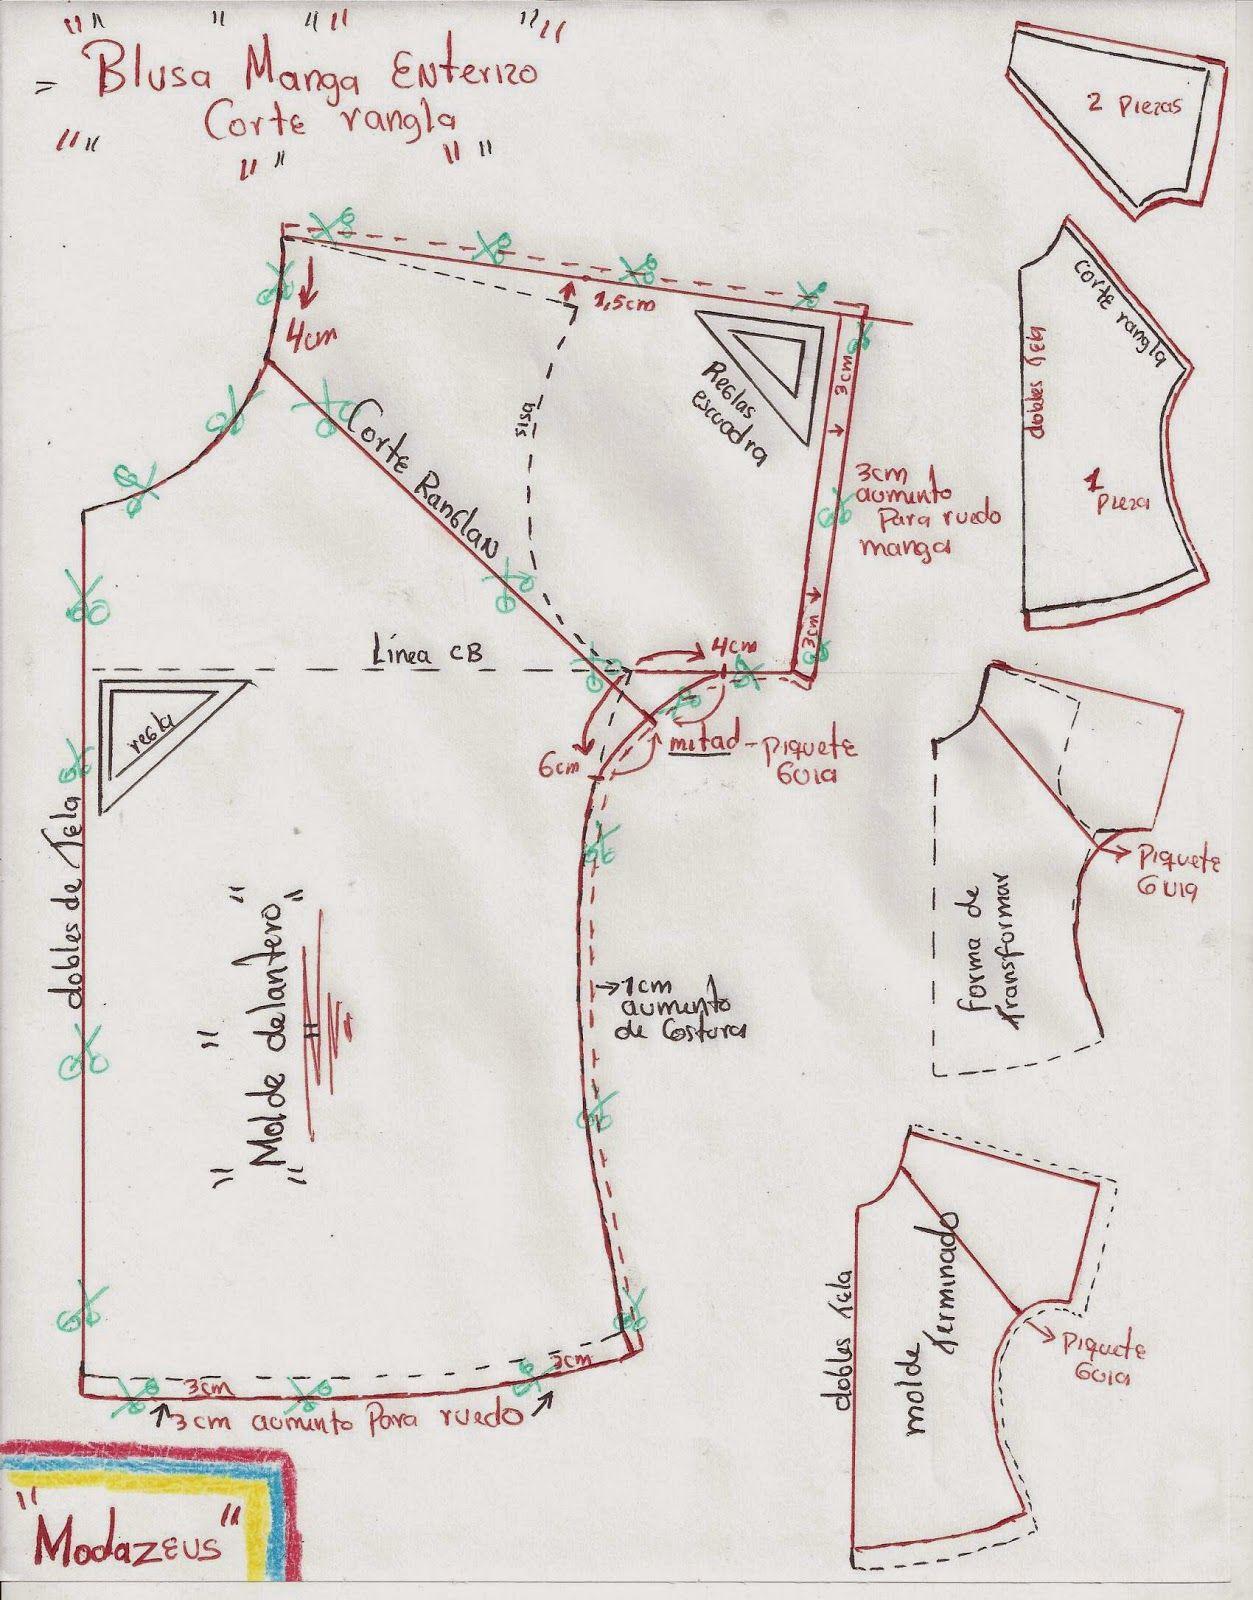 patron de blusa corte ranglan … | costura | Sewin…